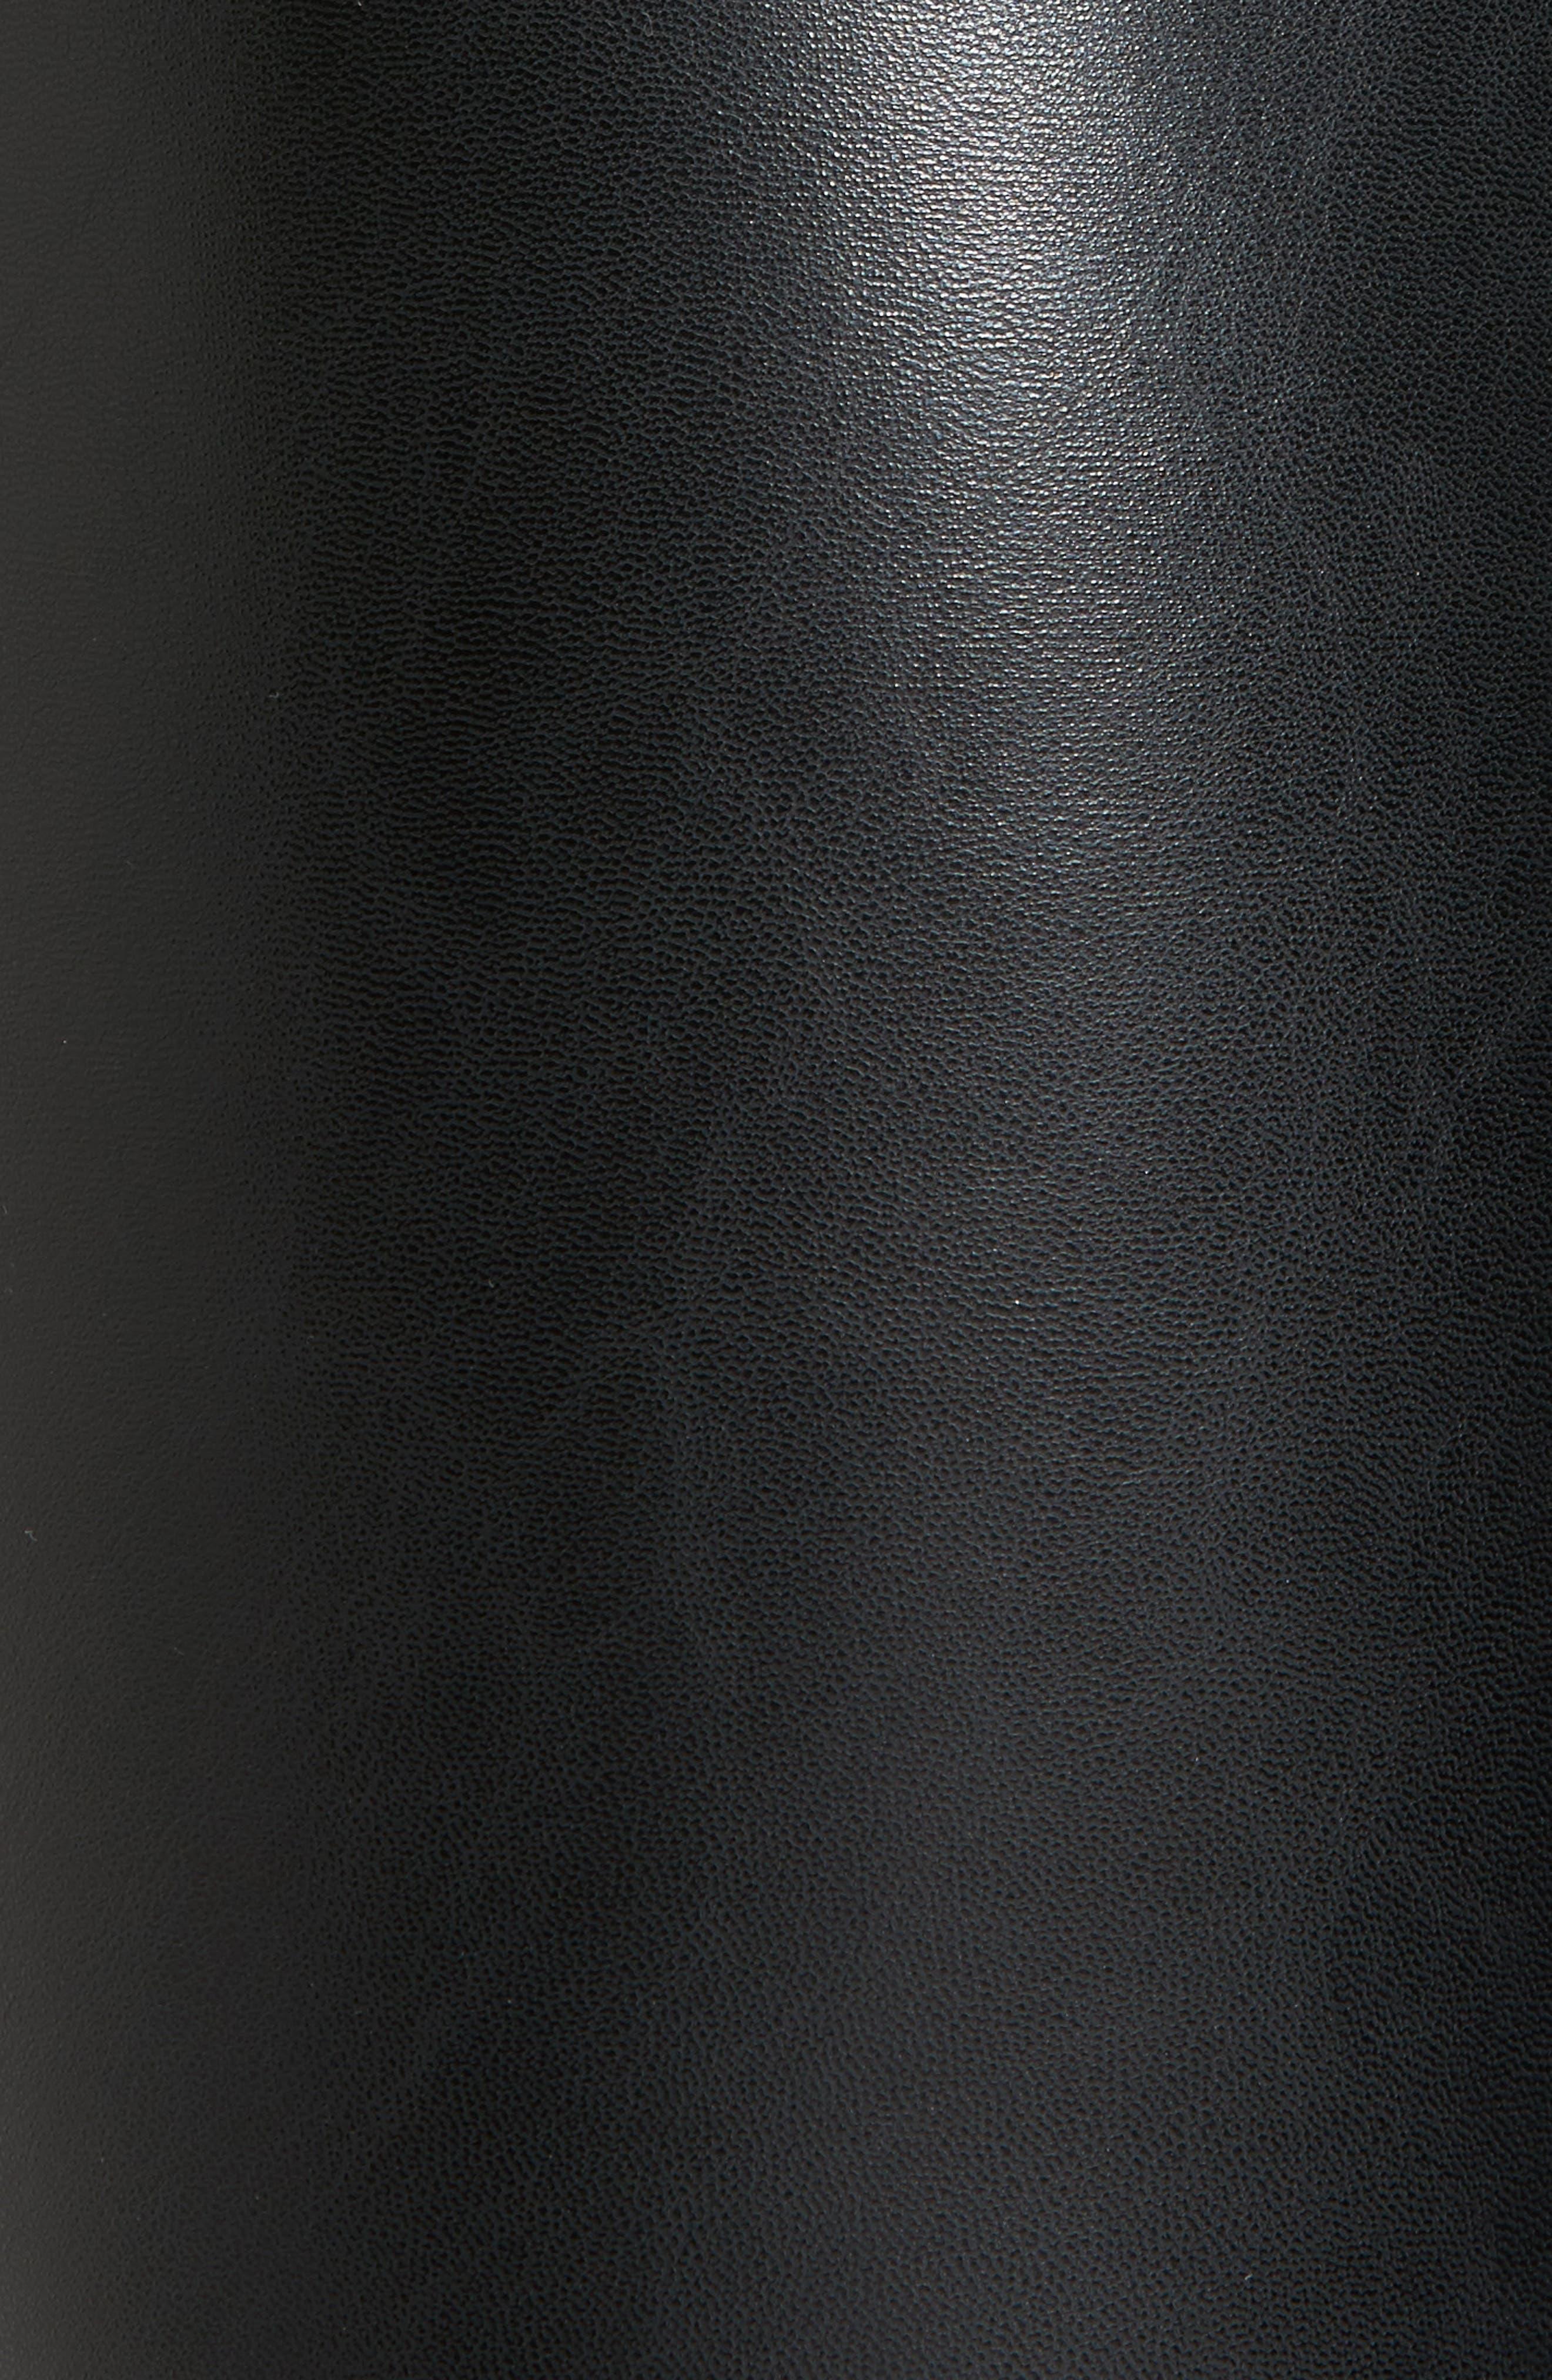 Cuffed Faux Leather Leggings,                             Alternate thumbnail 5, color,                             001